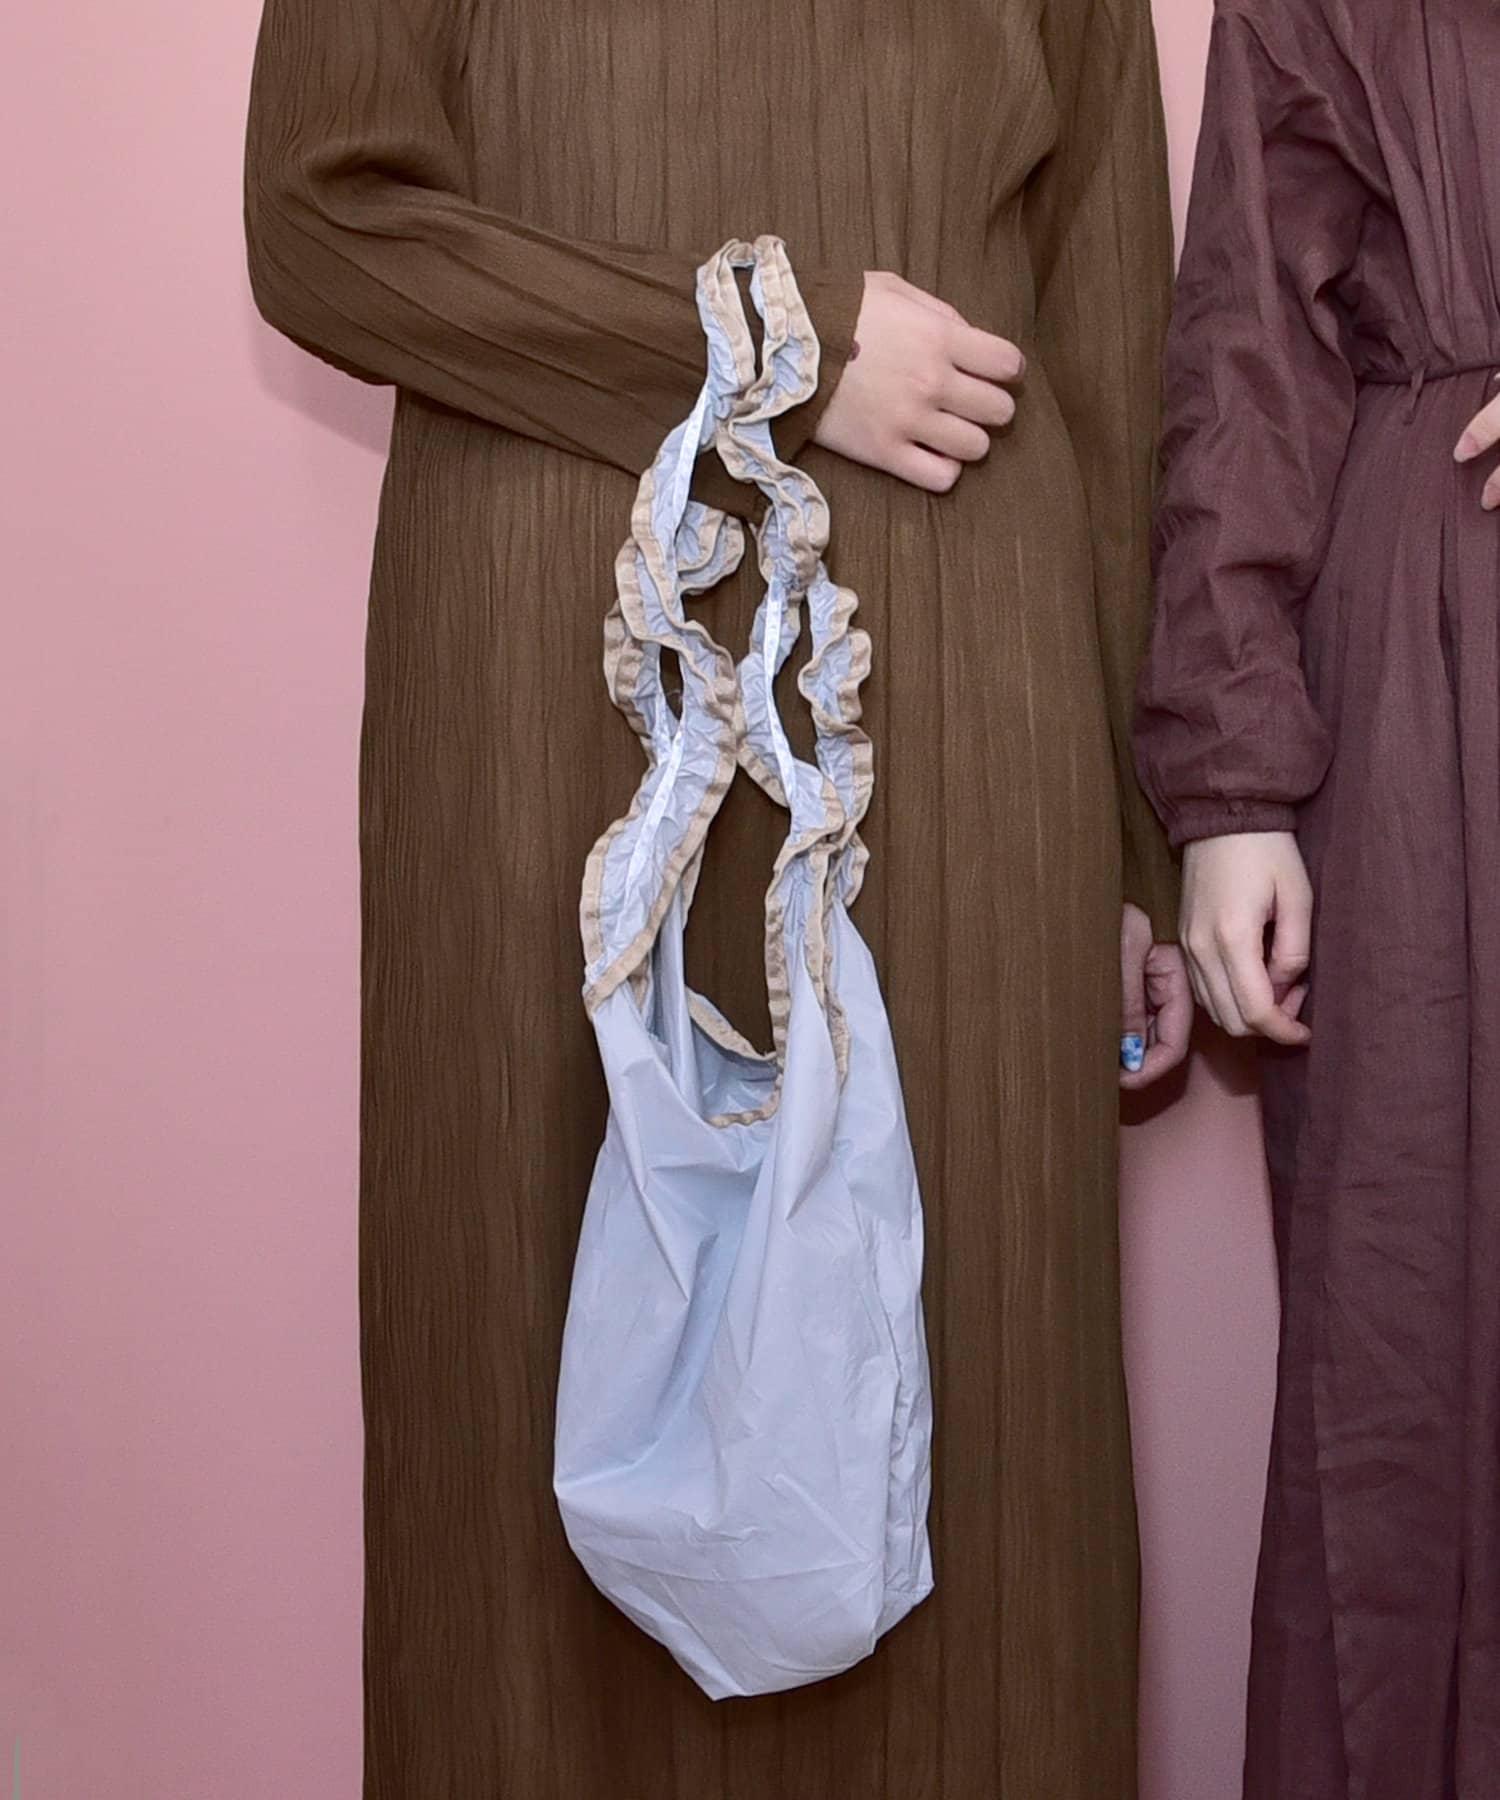 3COINS(スリーコインズ) 【ワタシの毎日を彩る】フリルバッグ